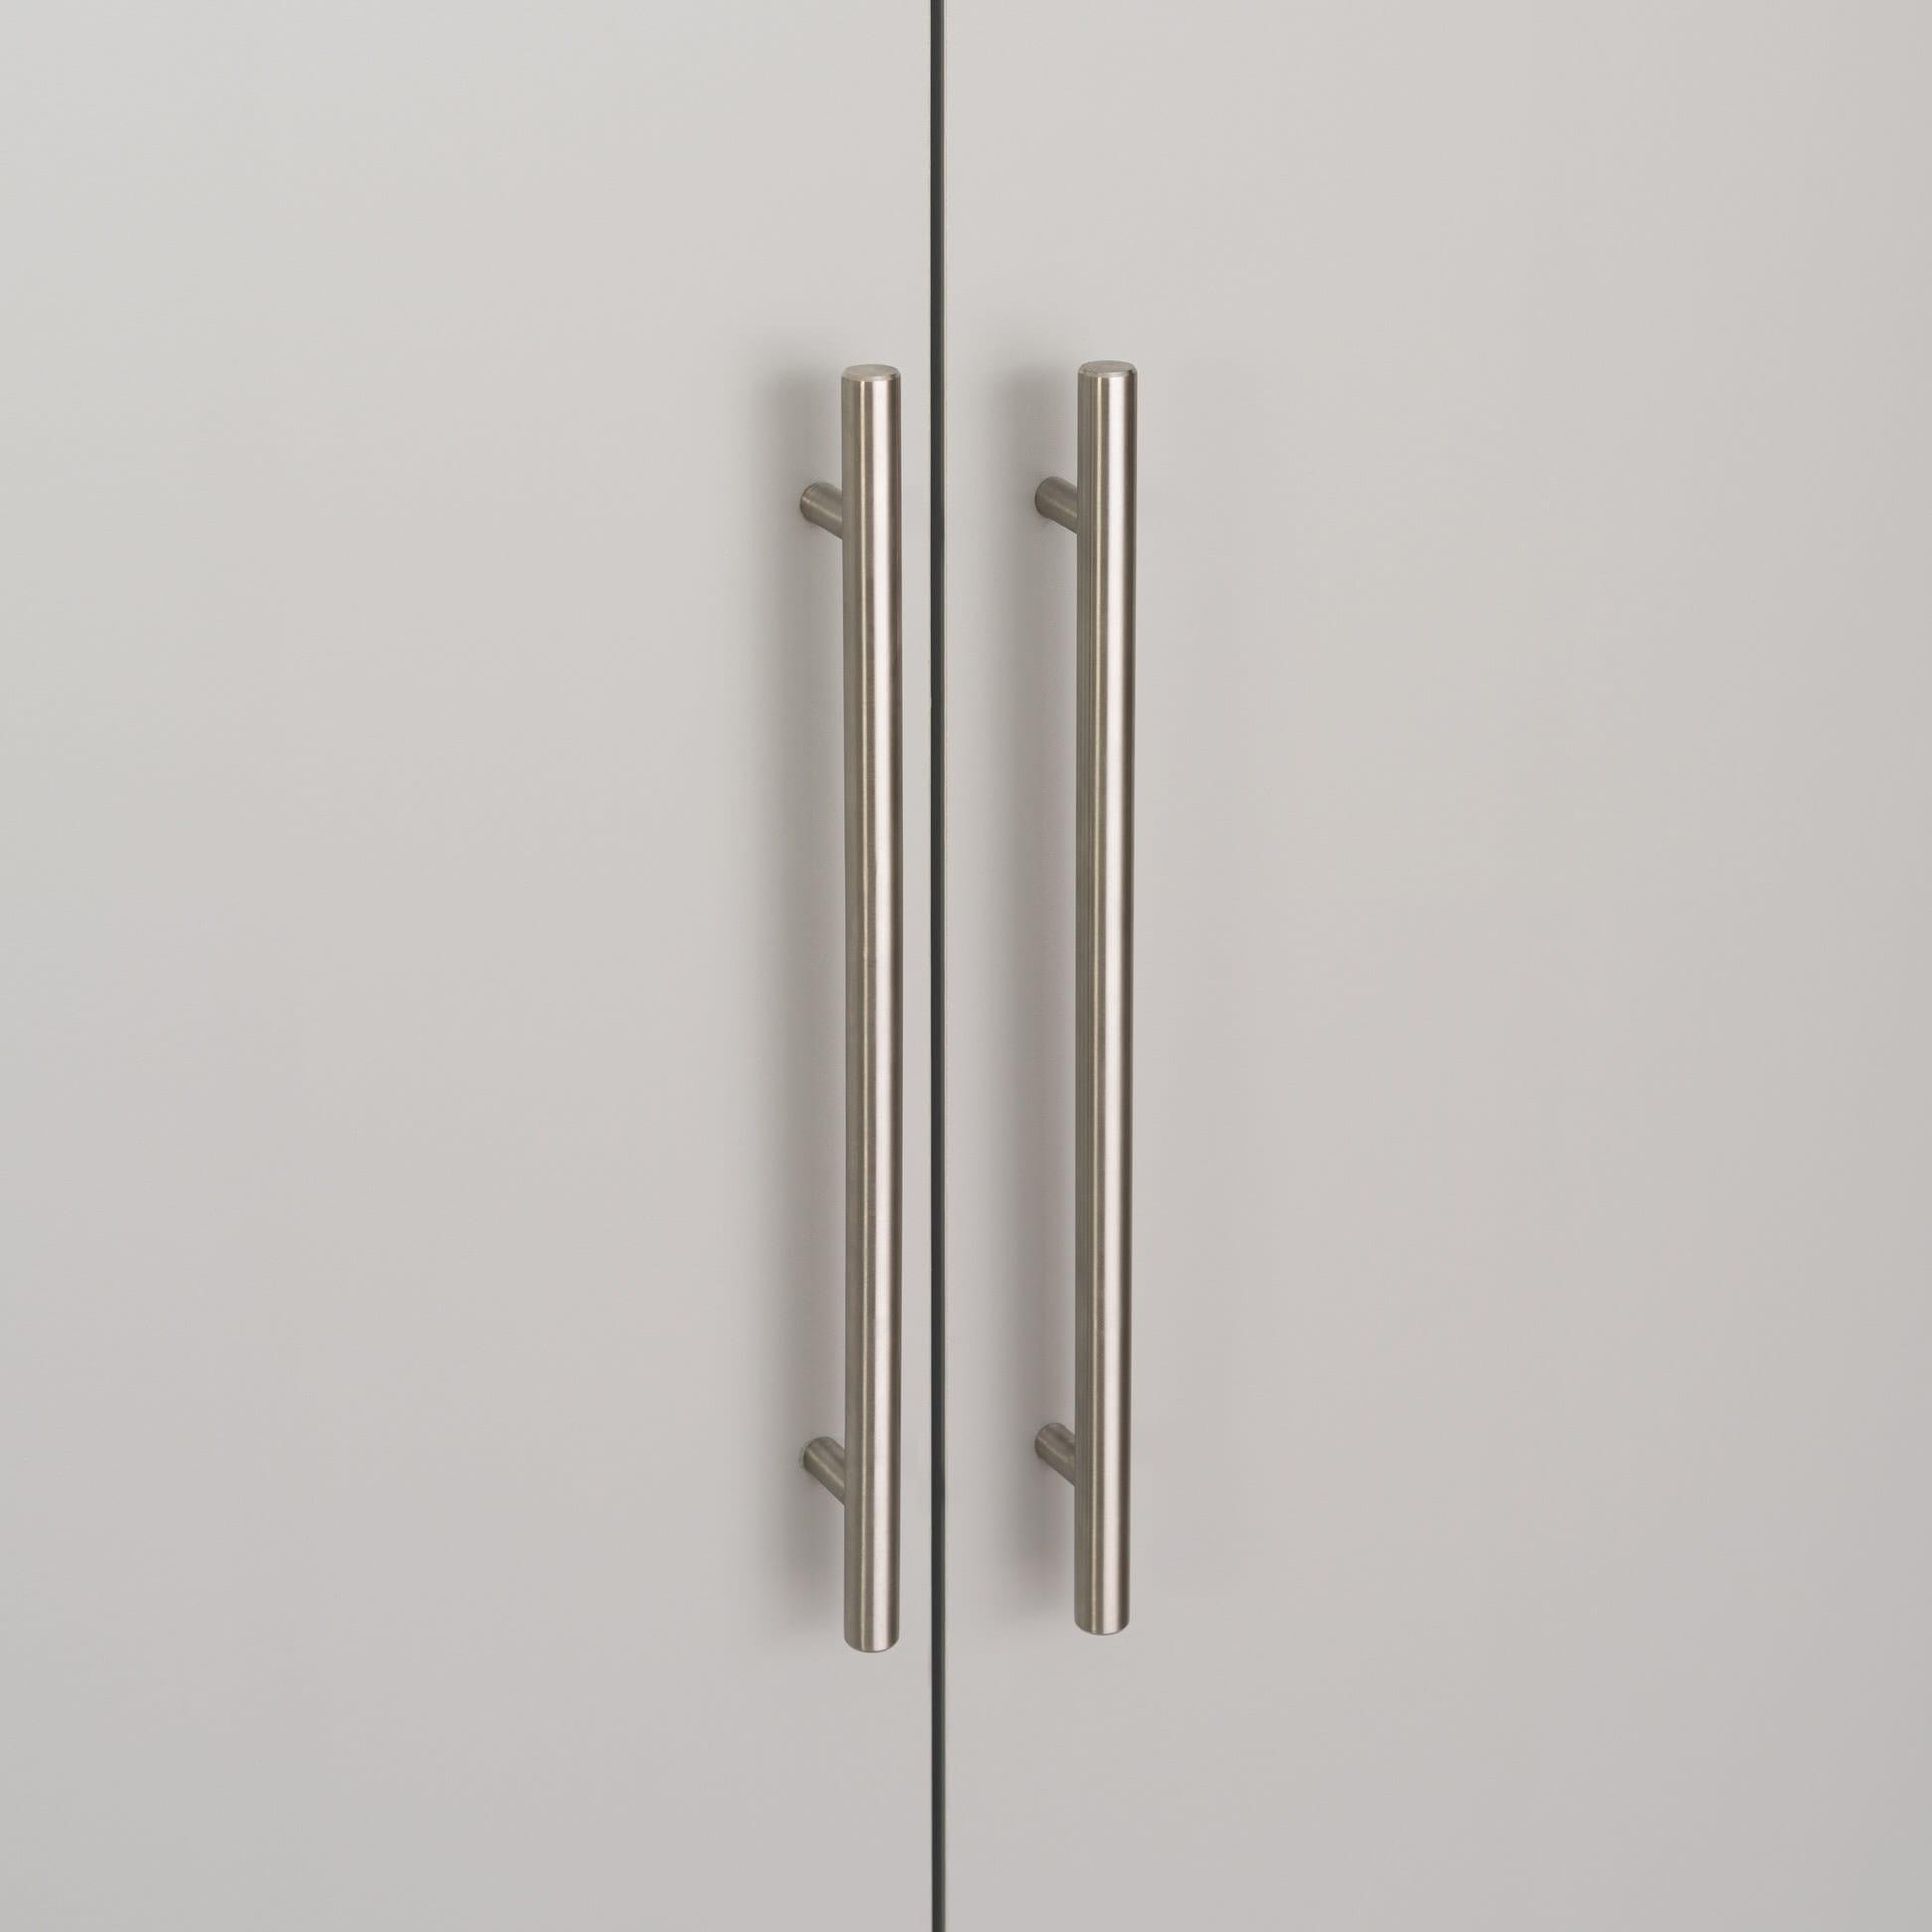 Hangups 24 inch upper storage cabinet by prepac for 24 inch upper kitchen cabinets